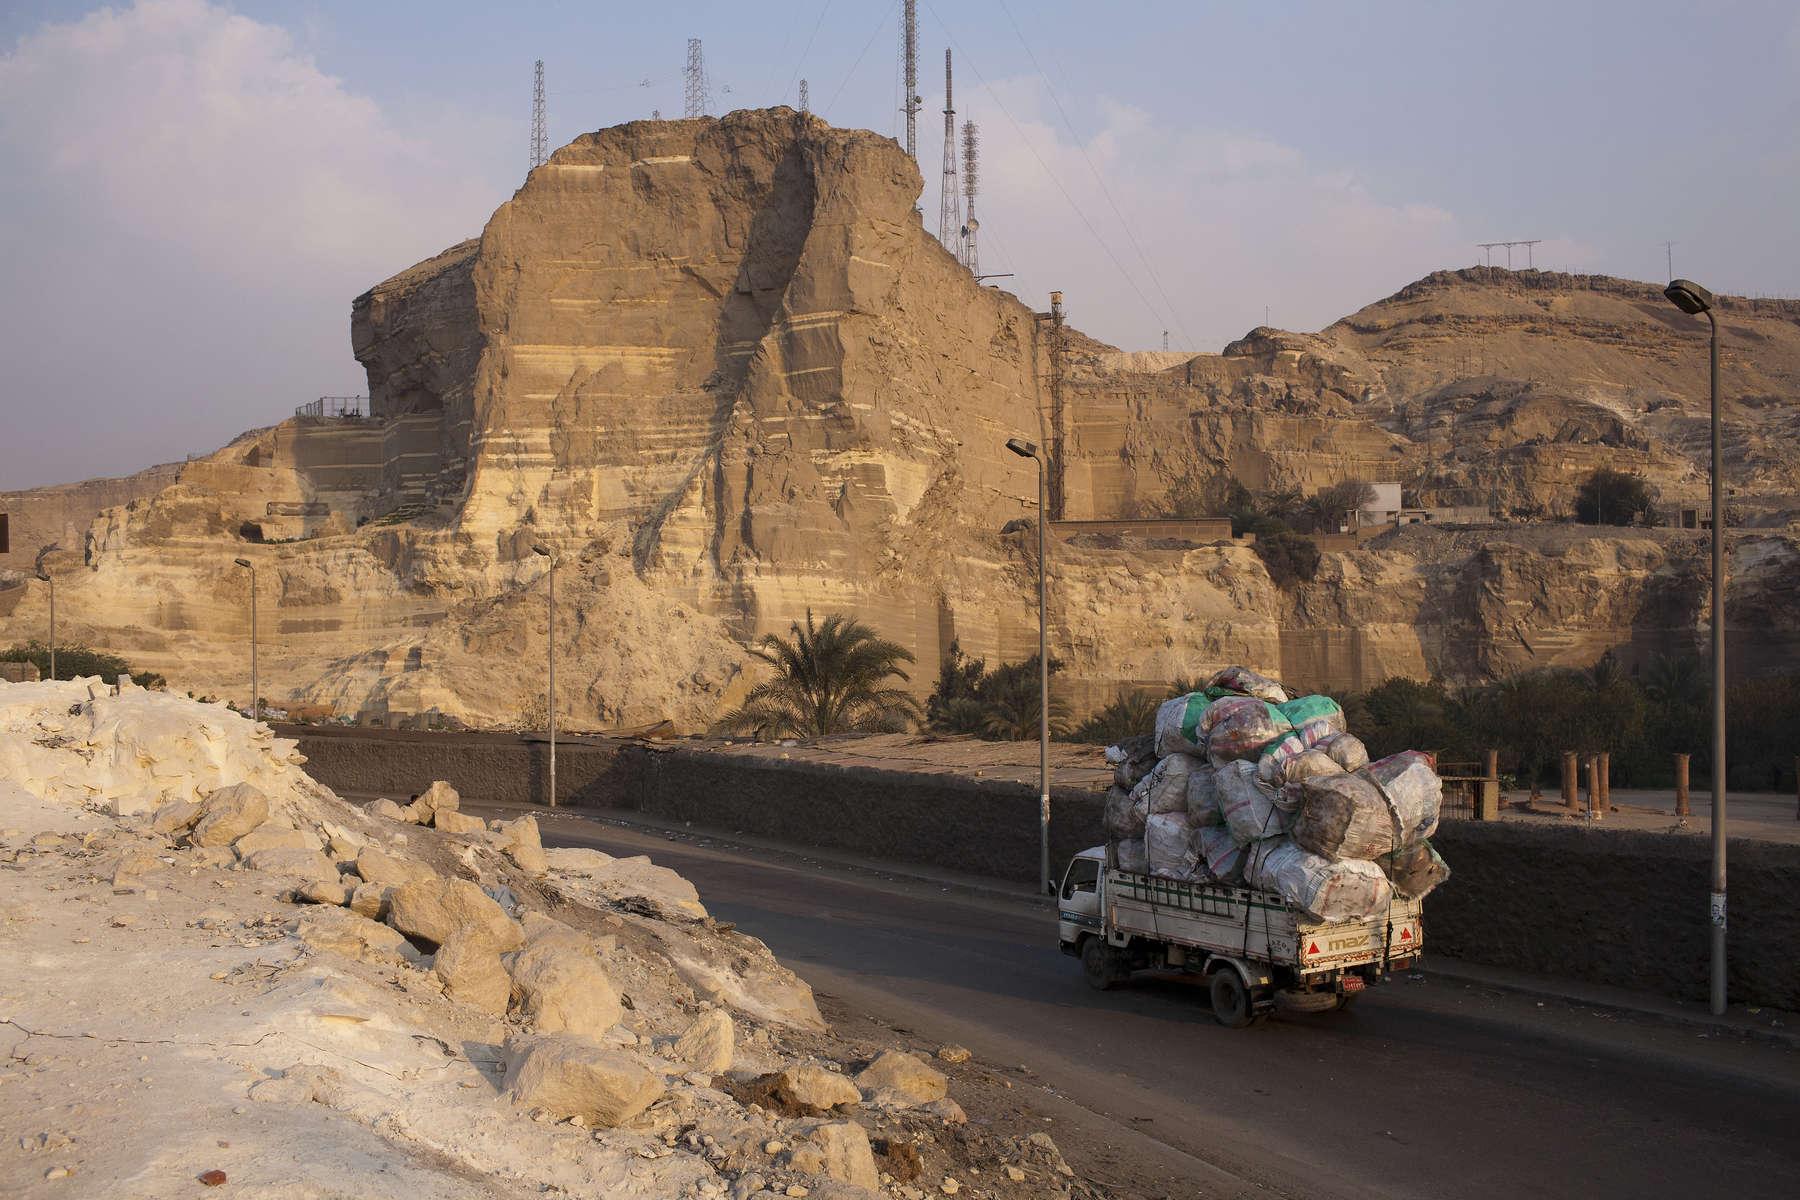 Zabaleen of Moqqatam - Truck